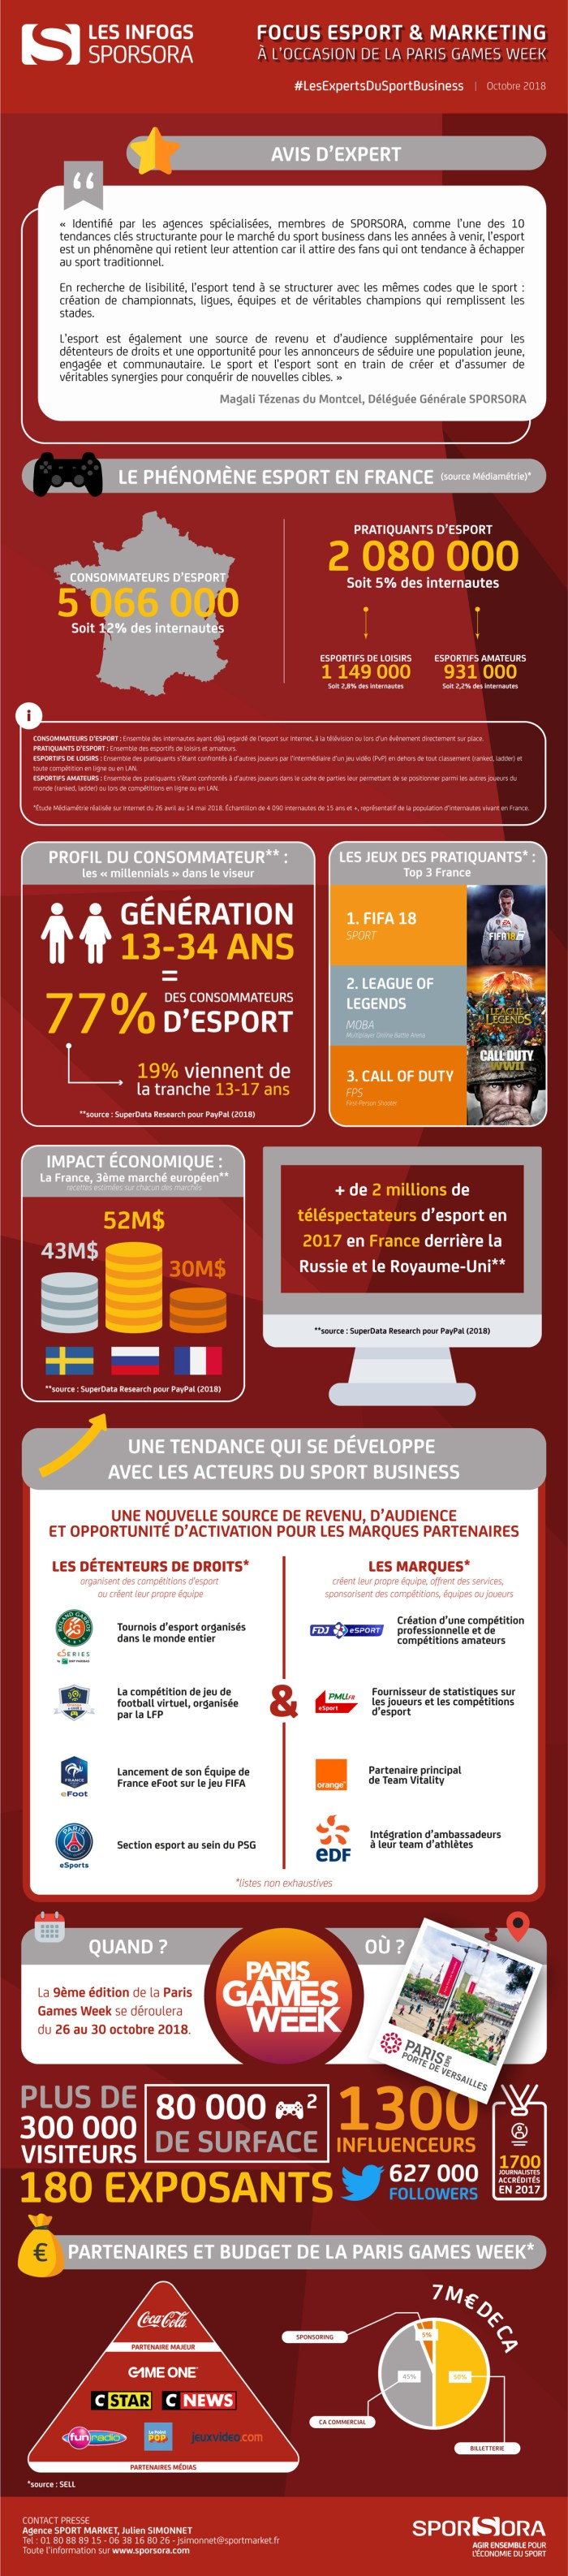 Les Infogs Sporsora - esport et marketing - Oct 2018.jpg